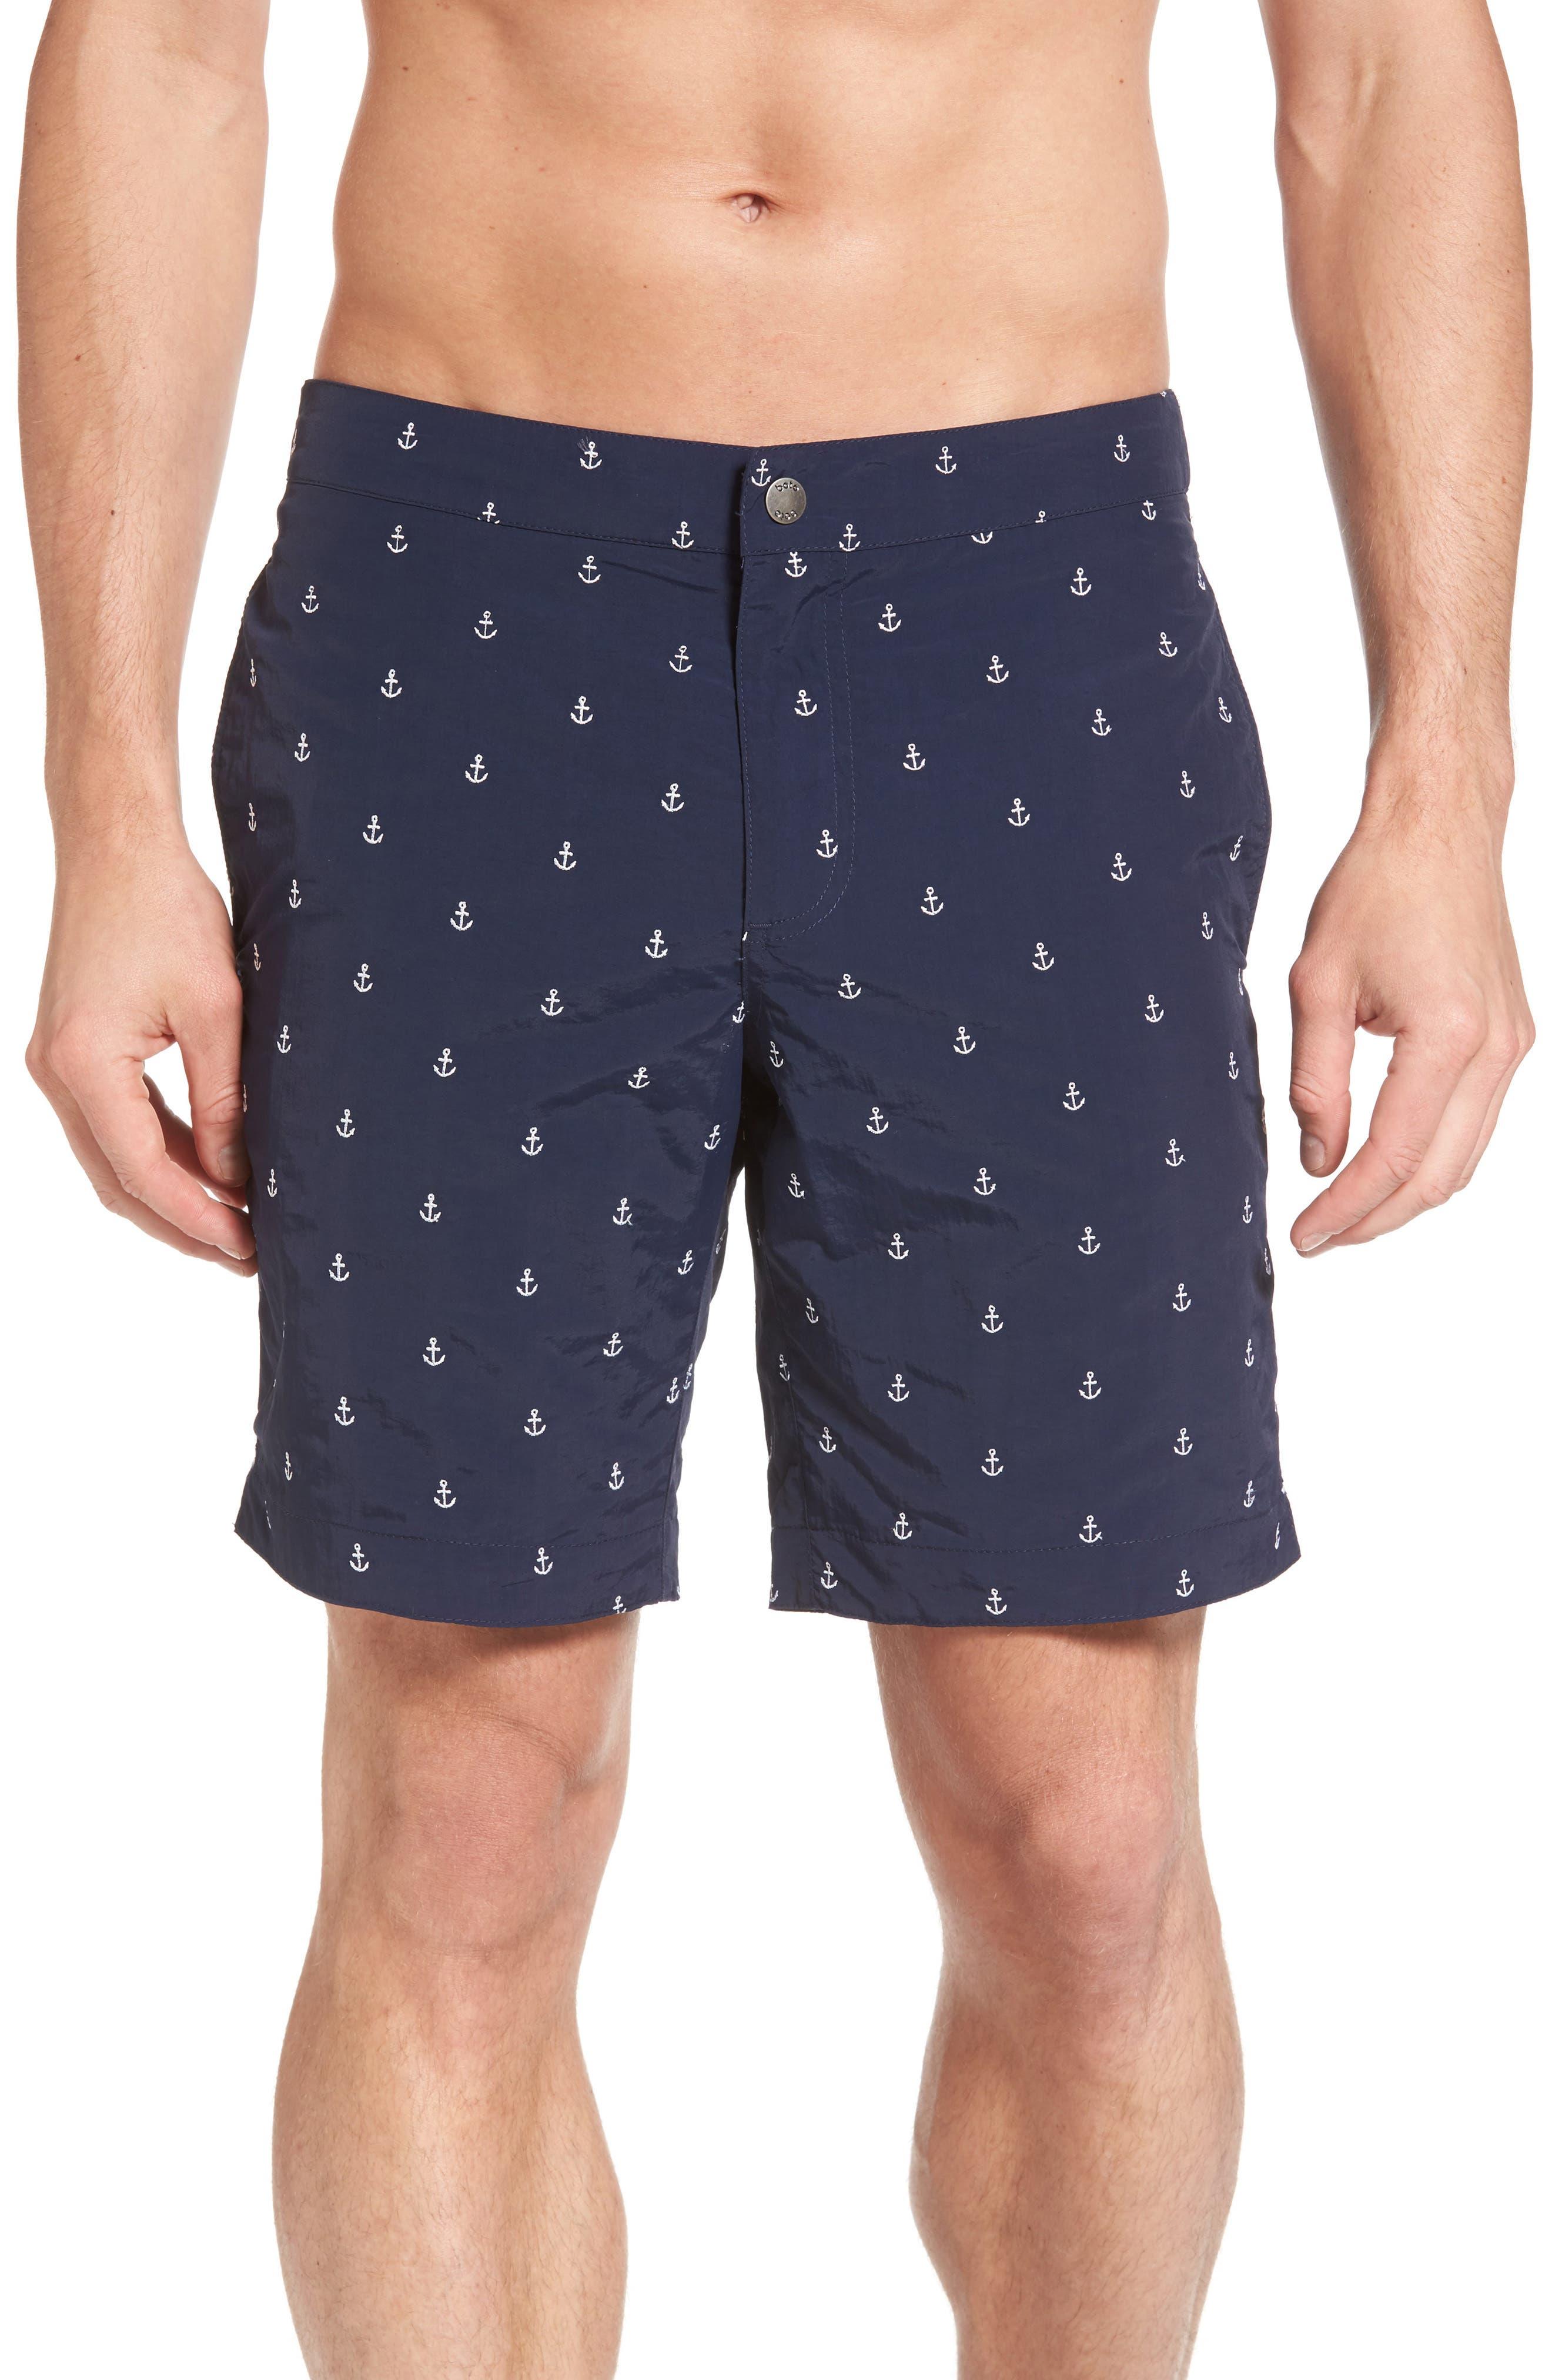 boto Aruba Embroidered Board Shorts